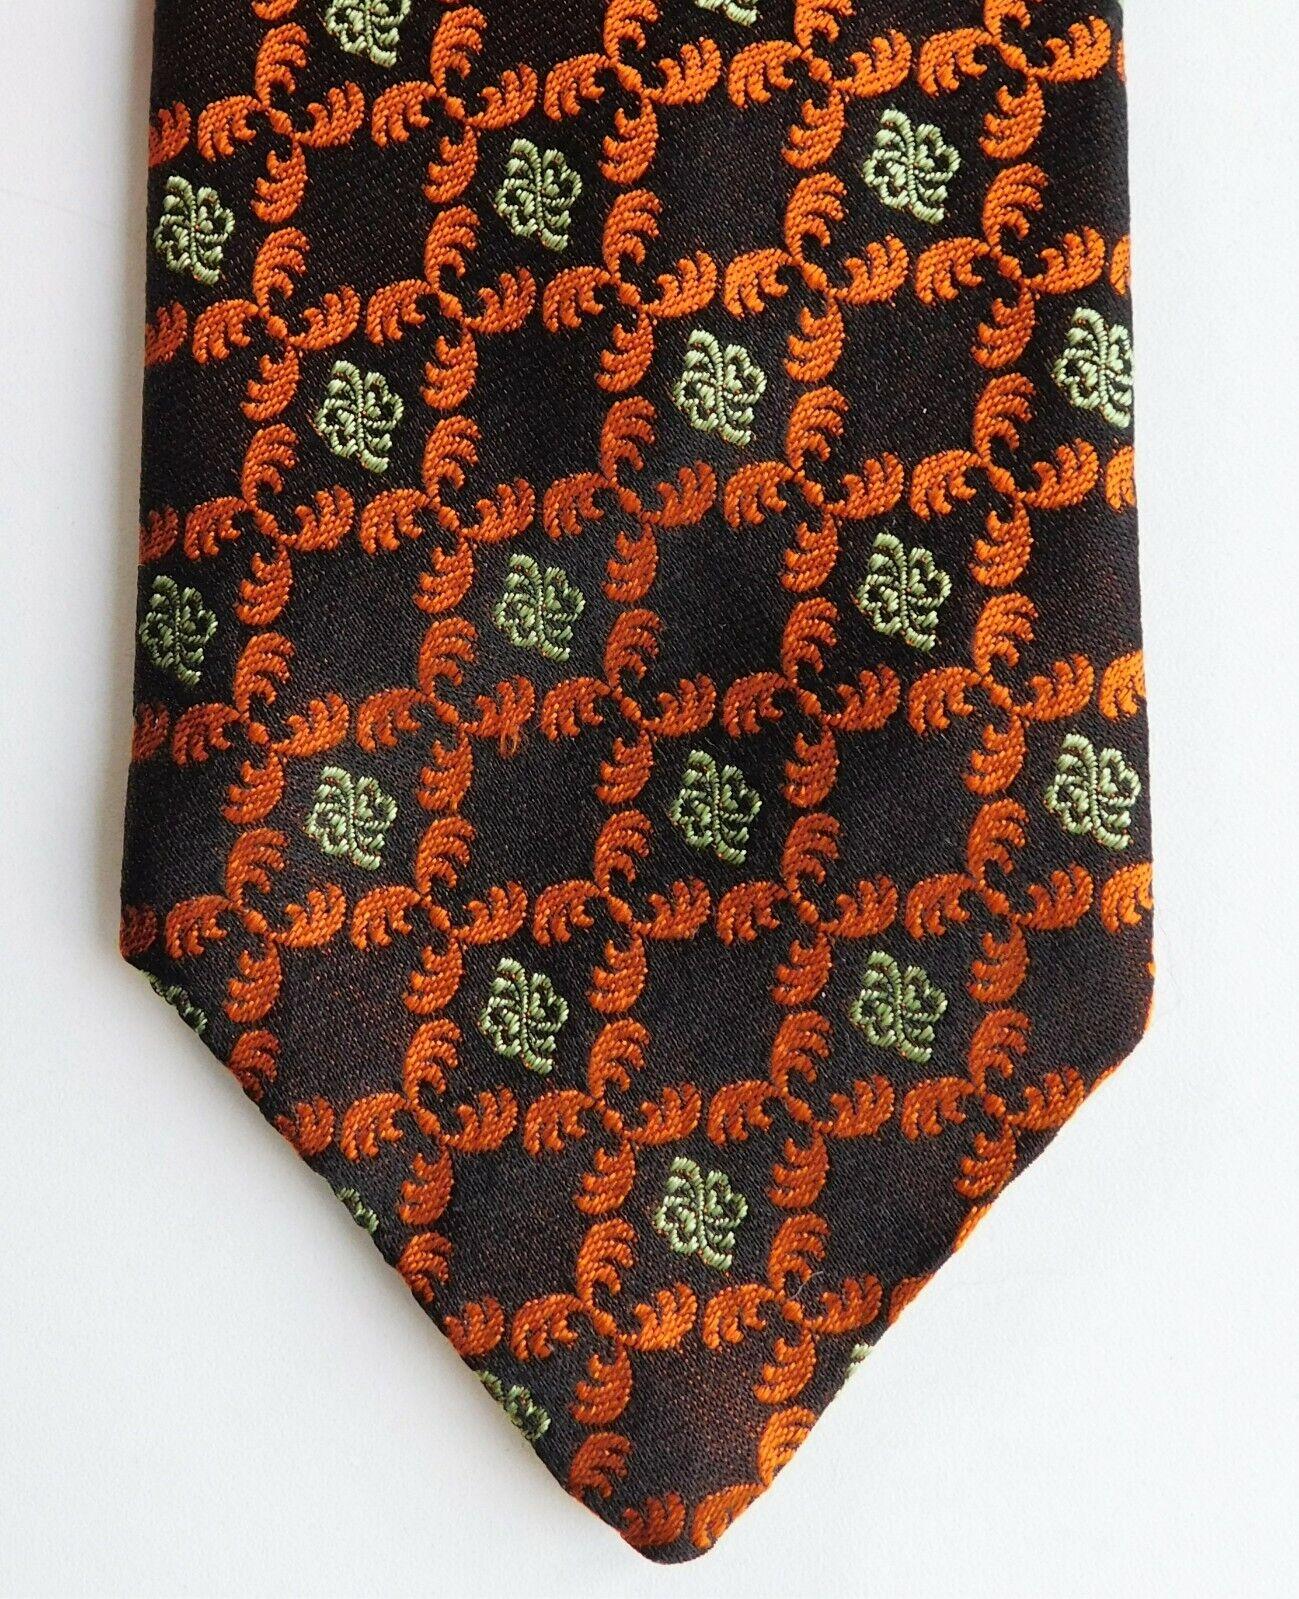 Bright Tropiccadilly silk tie Airey & Wheeler vintage 1970s orange brocade